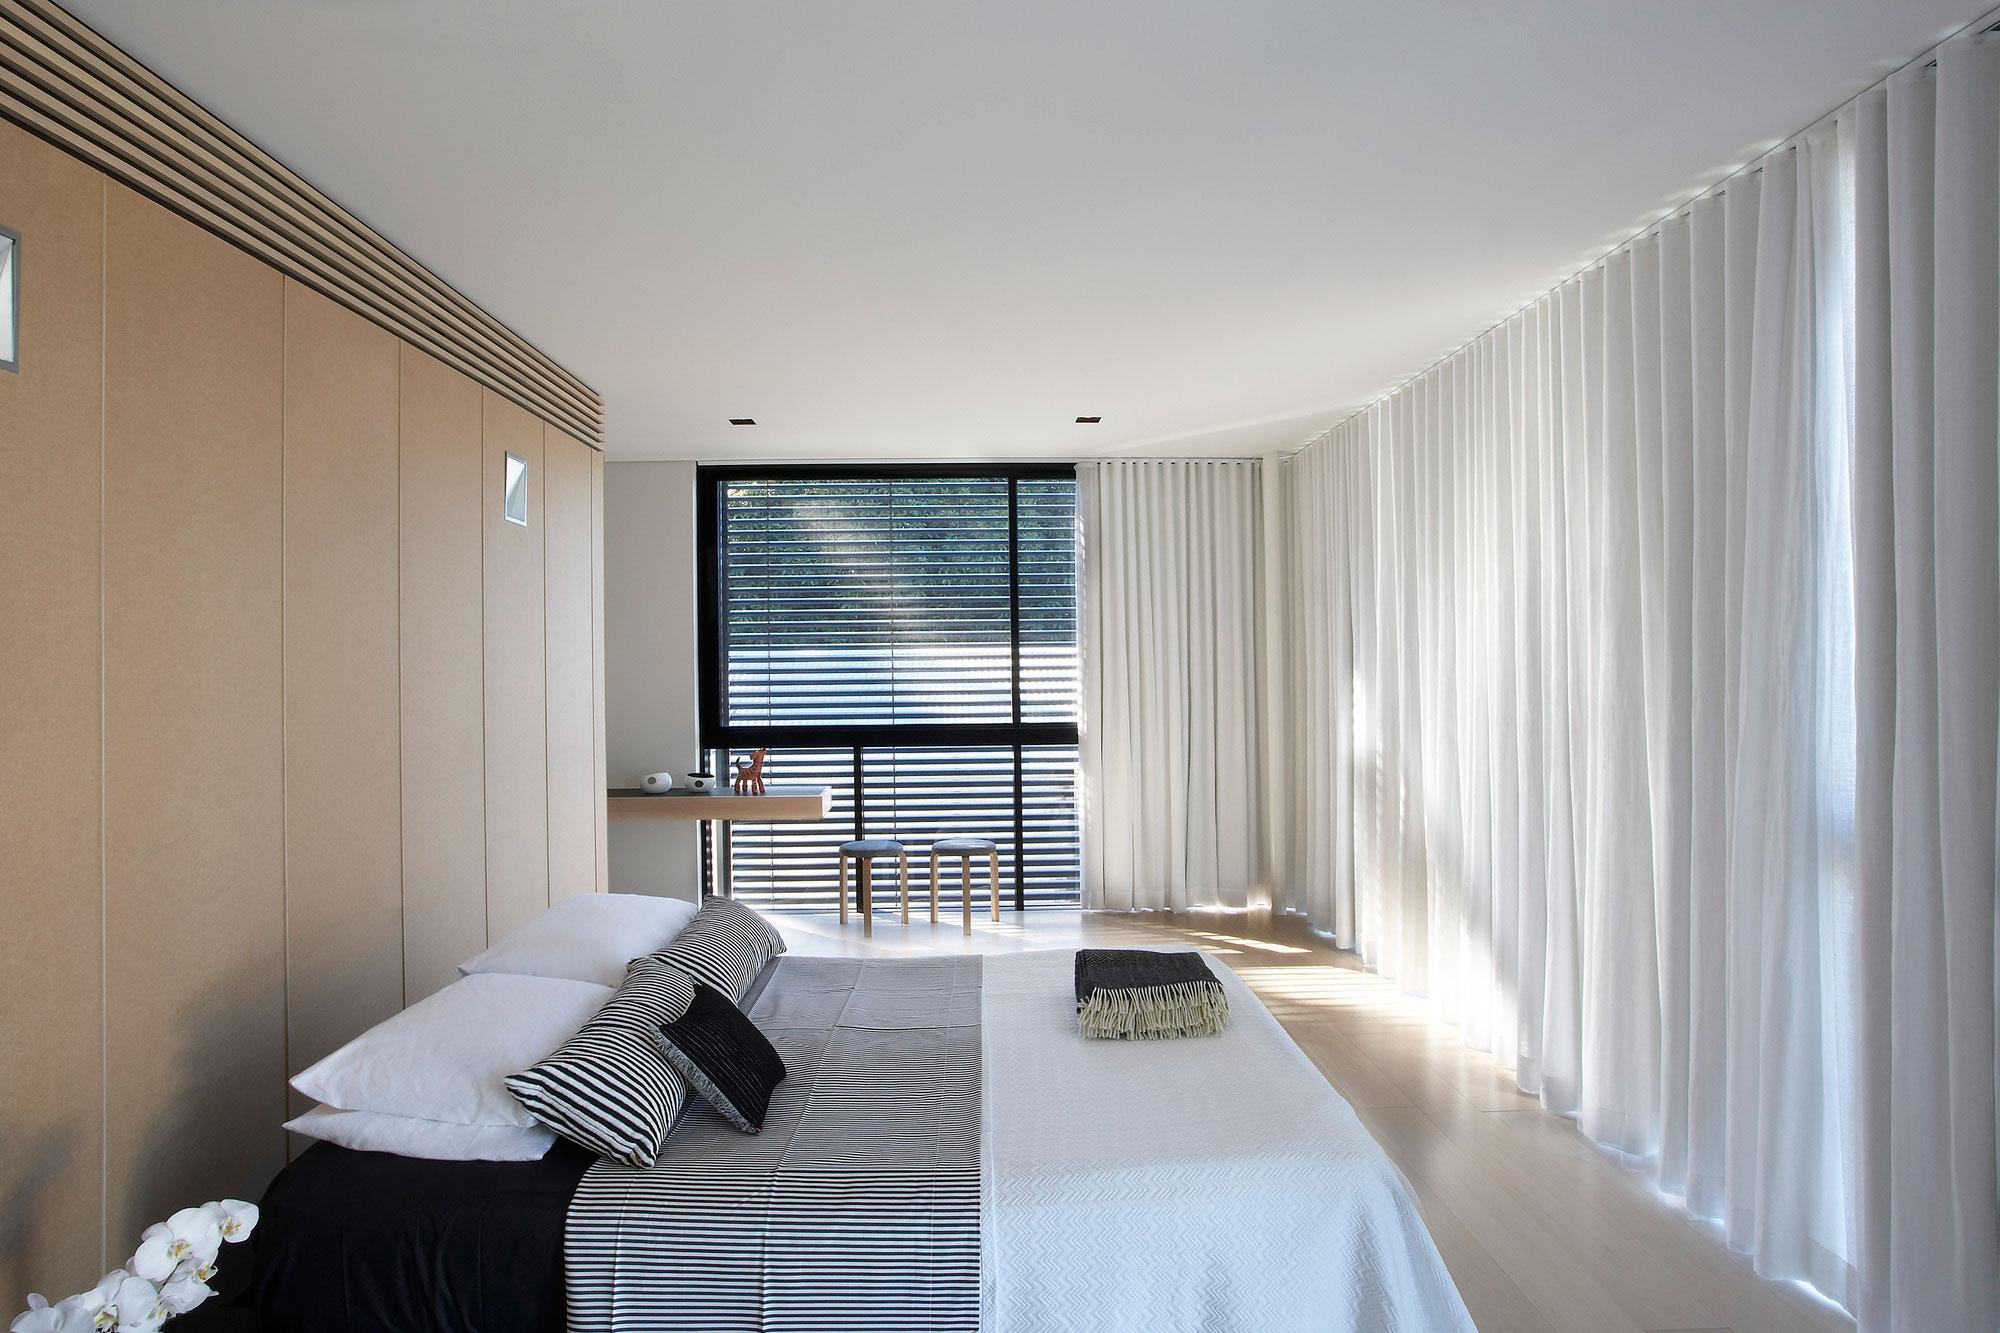 What Window Treatment Should I Use?